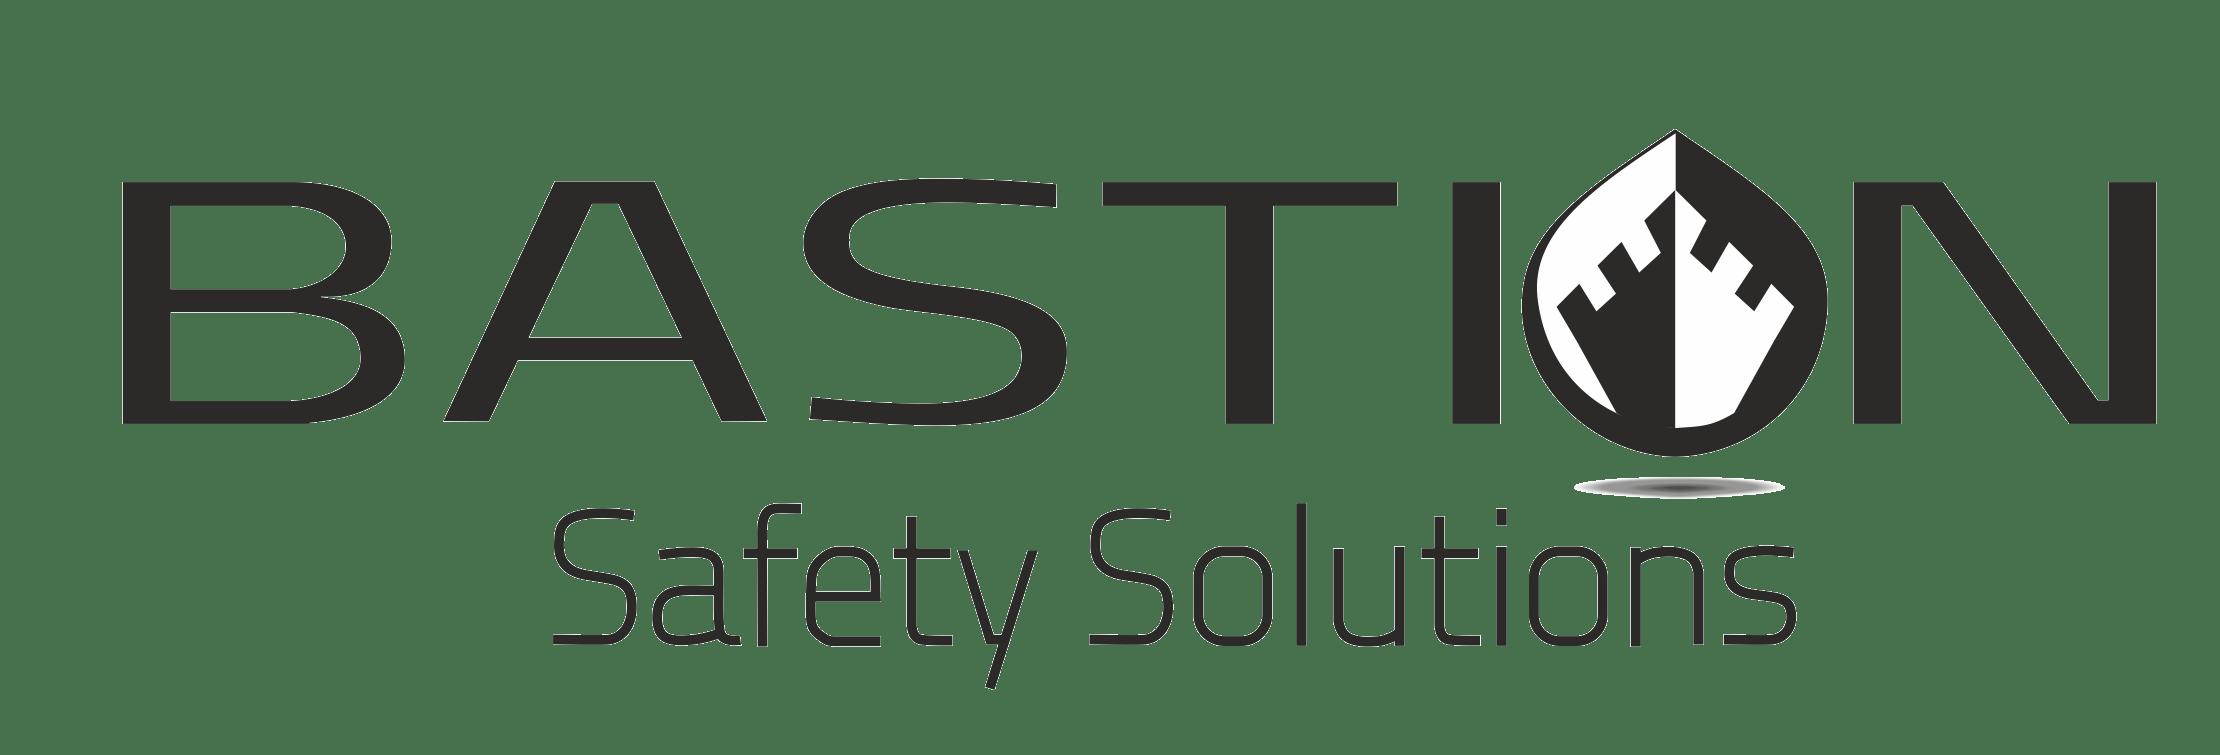 Hazard Assessment Training Online: The three-step process